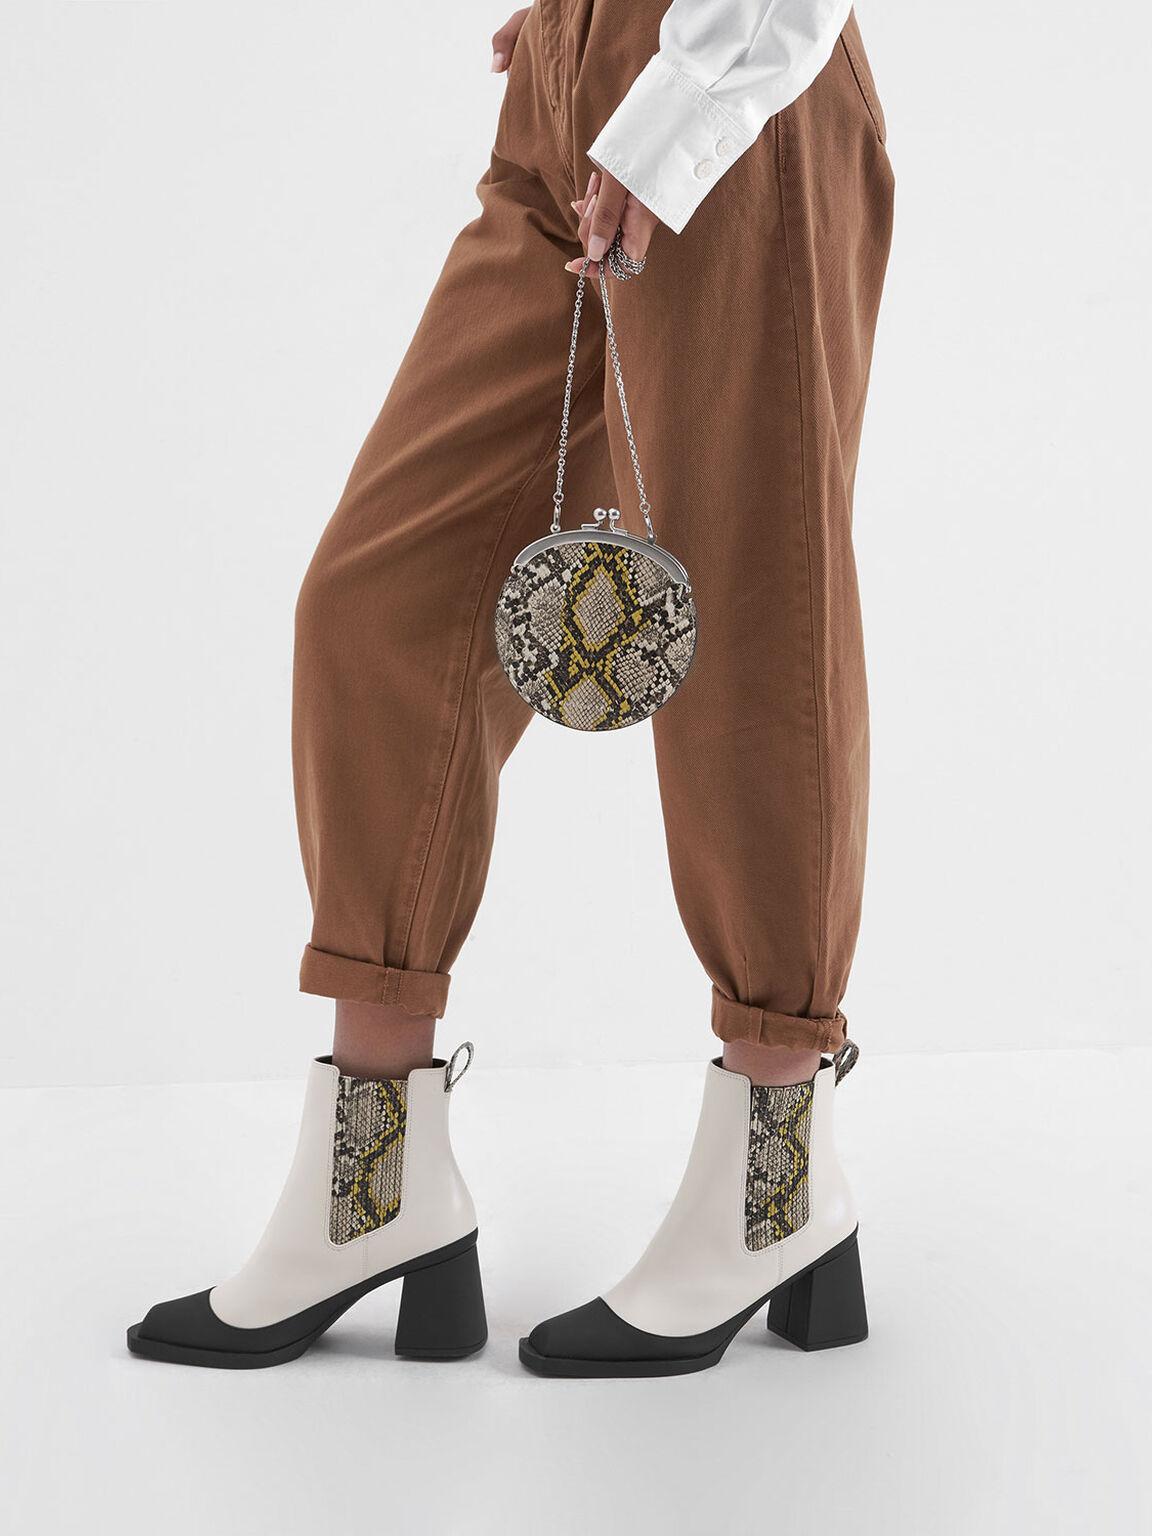 Snake Print Chelsea Boots, Cream, hi-res